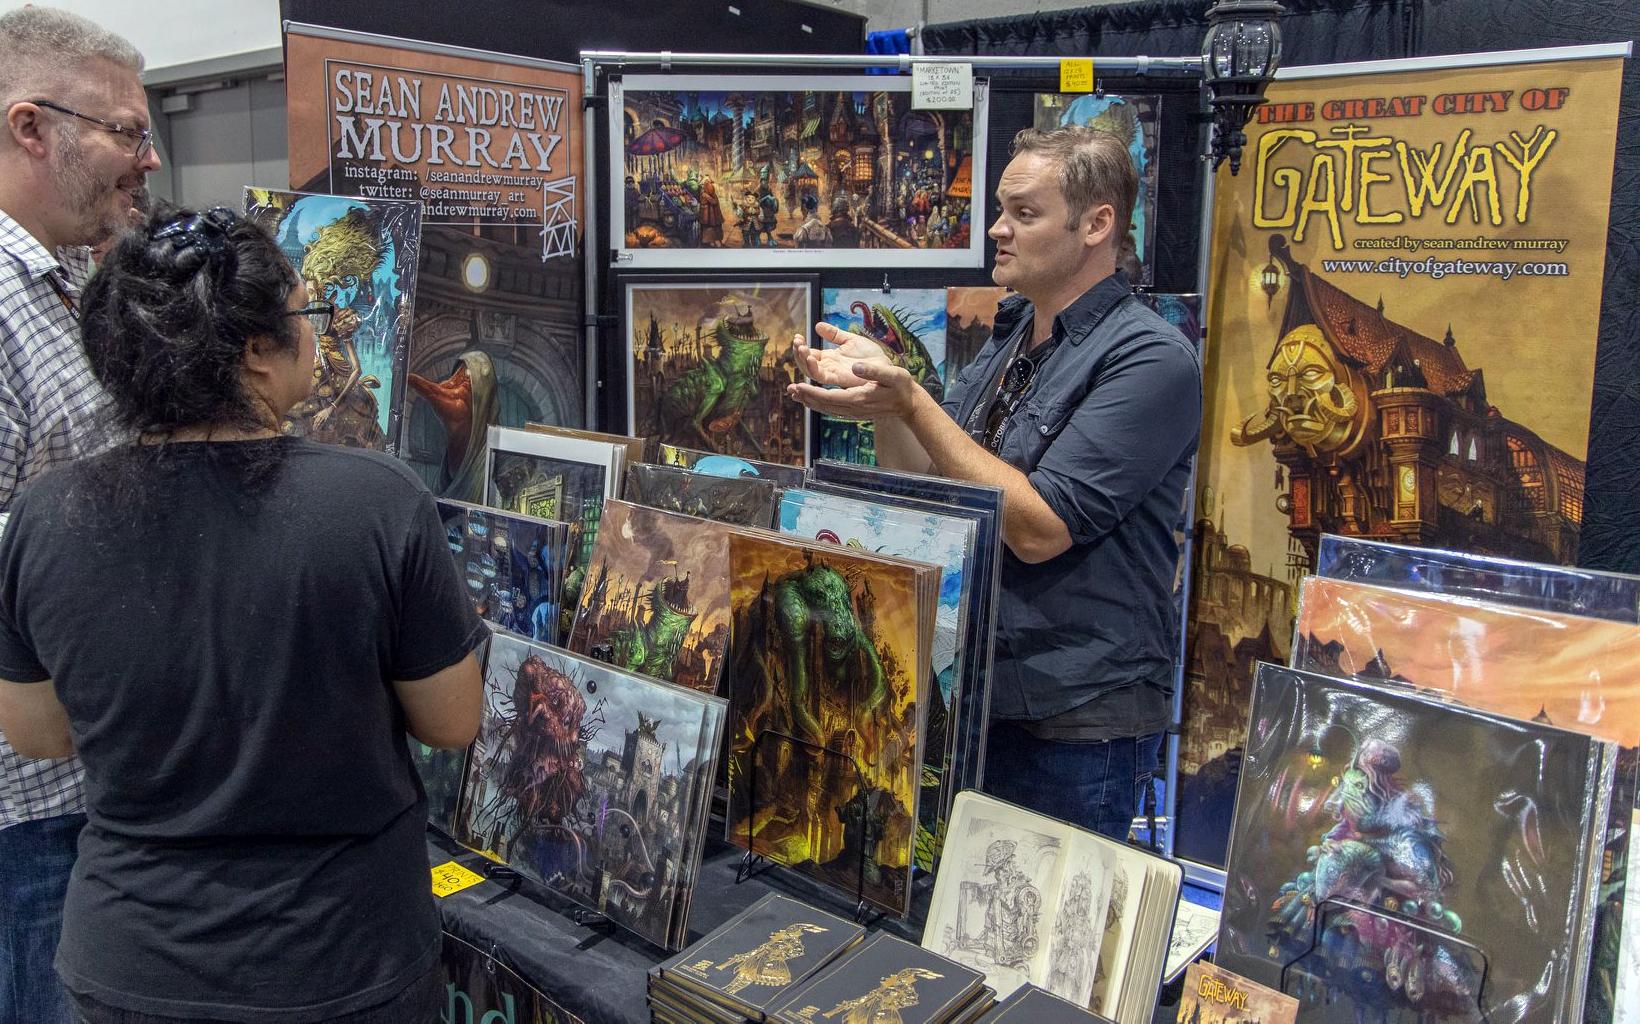 Sean Murray in his Gateway art booth at San Diego Comic Con.